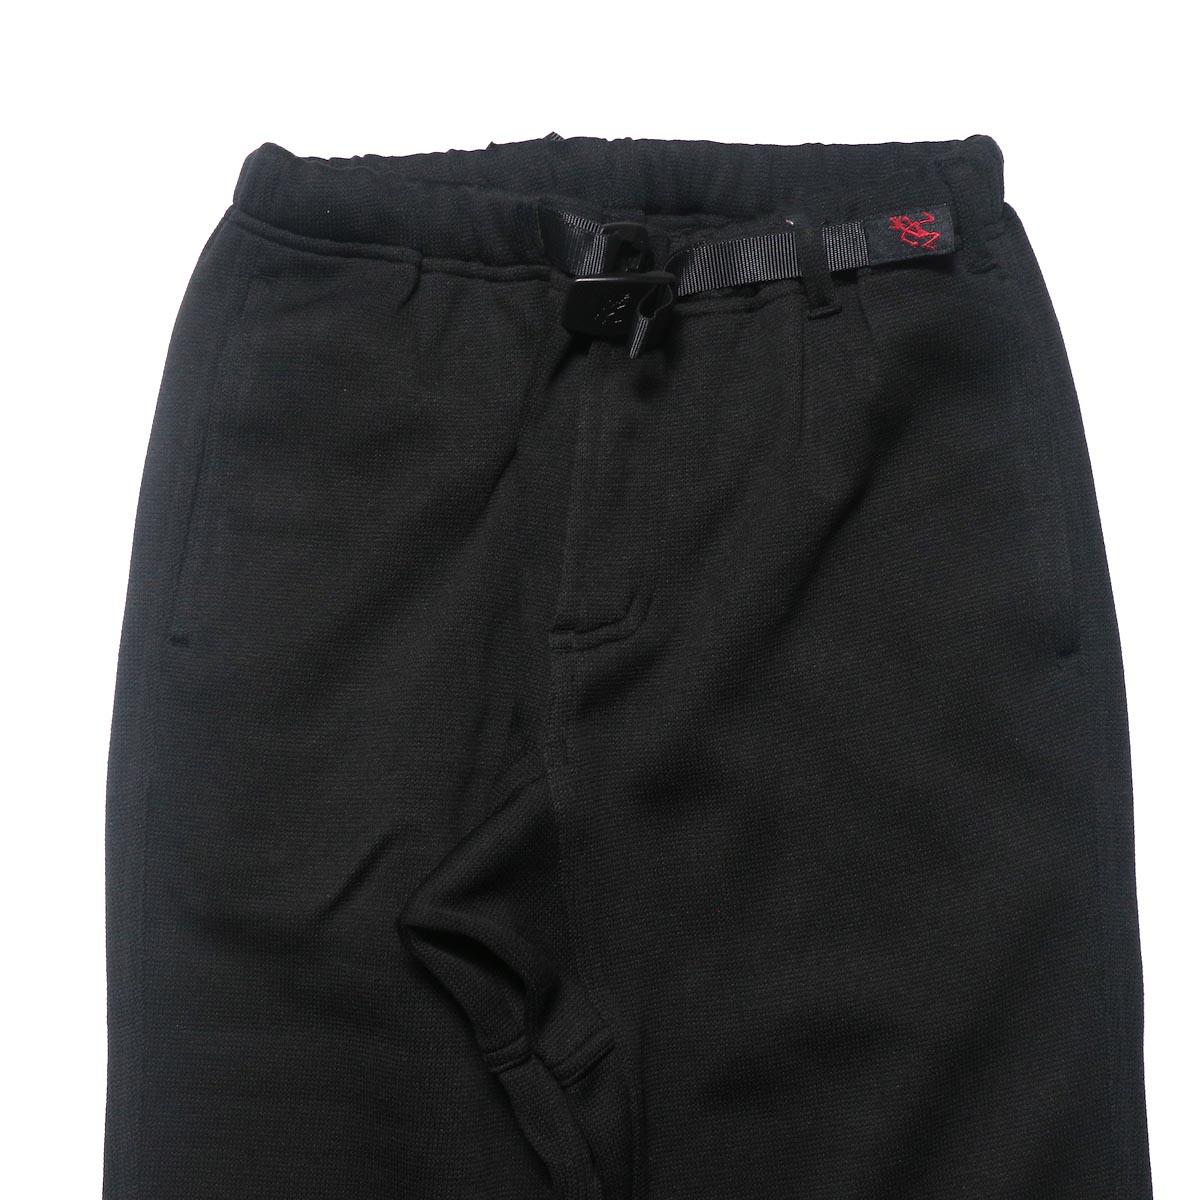 GRAMICCI / BONDING KNIT FLEECE NN-PANTS JUST CUT (Black)ウエスト